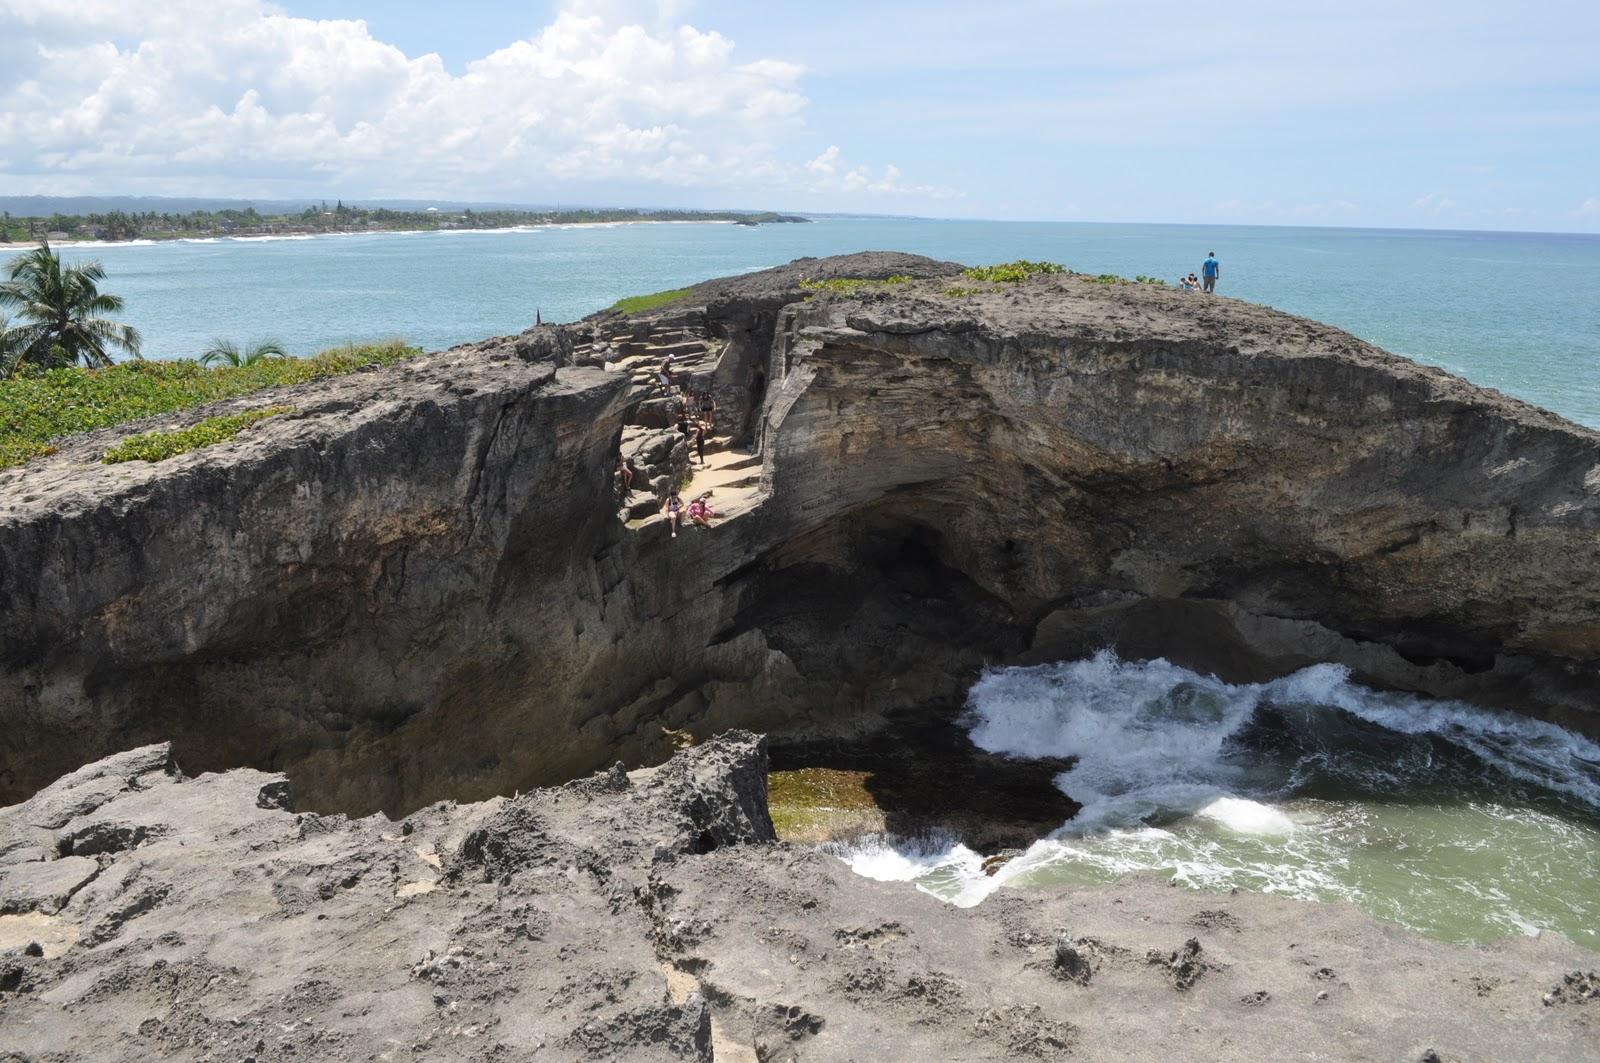 Cueva del indio arecibo puerto rico turismo interno for Turismo interno p r